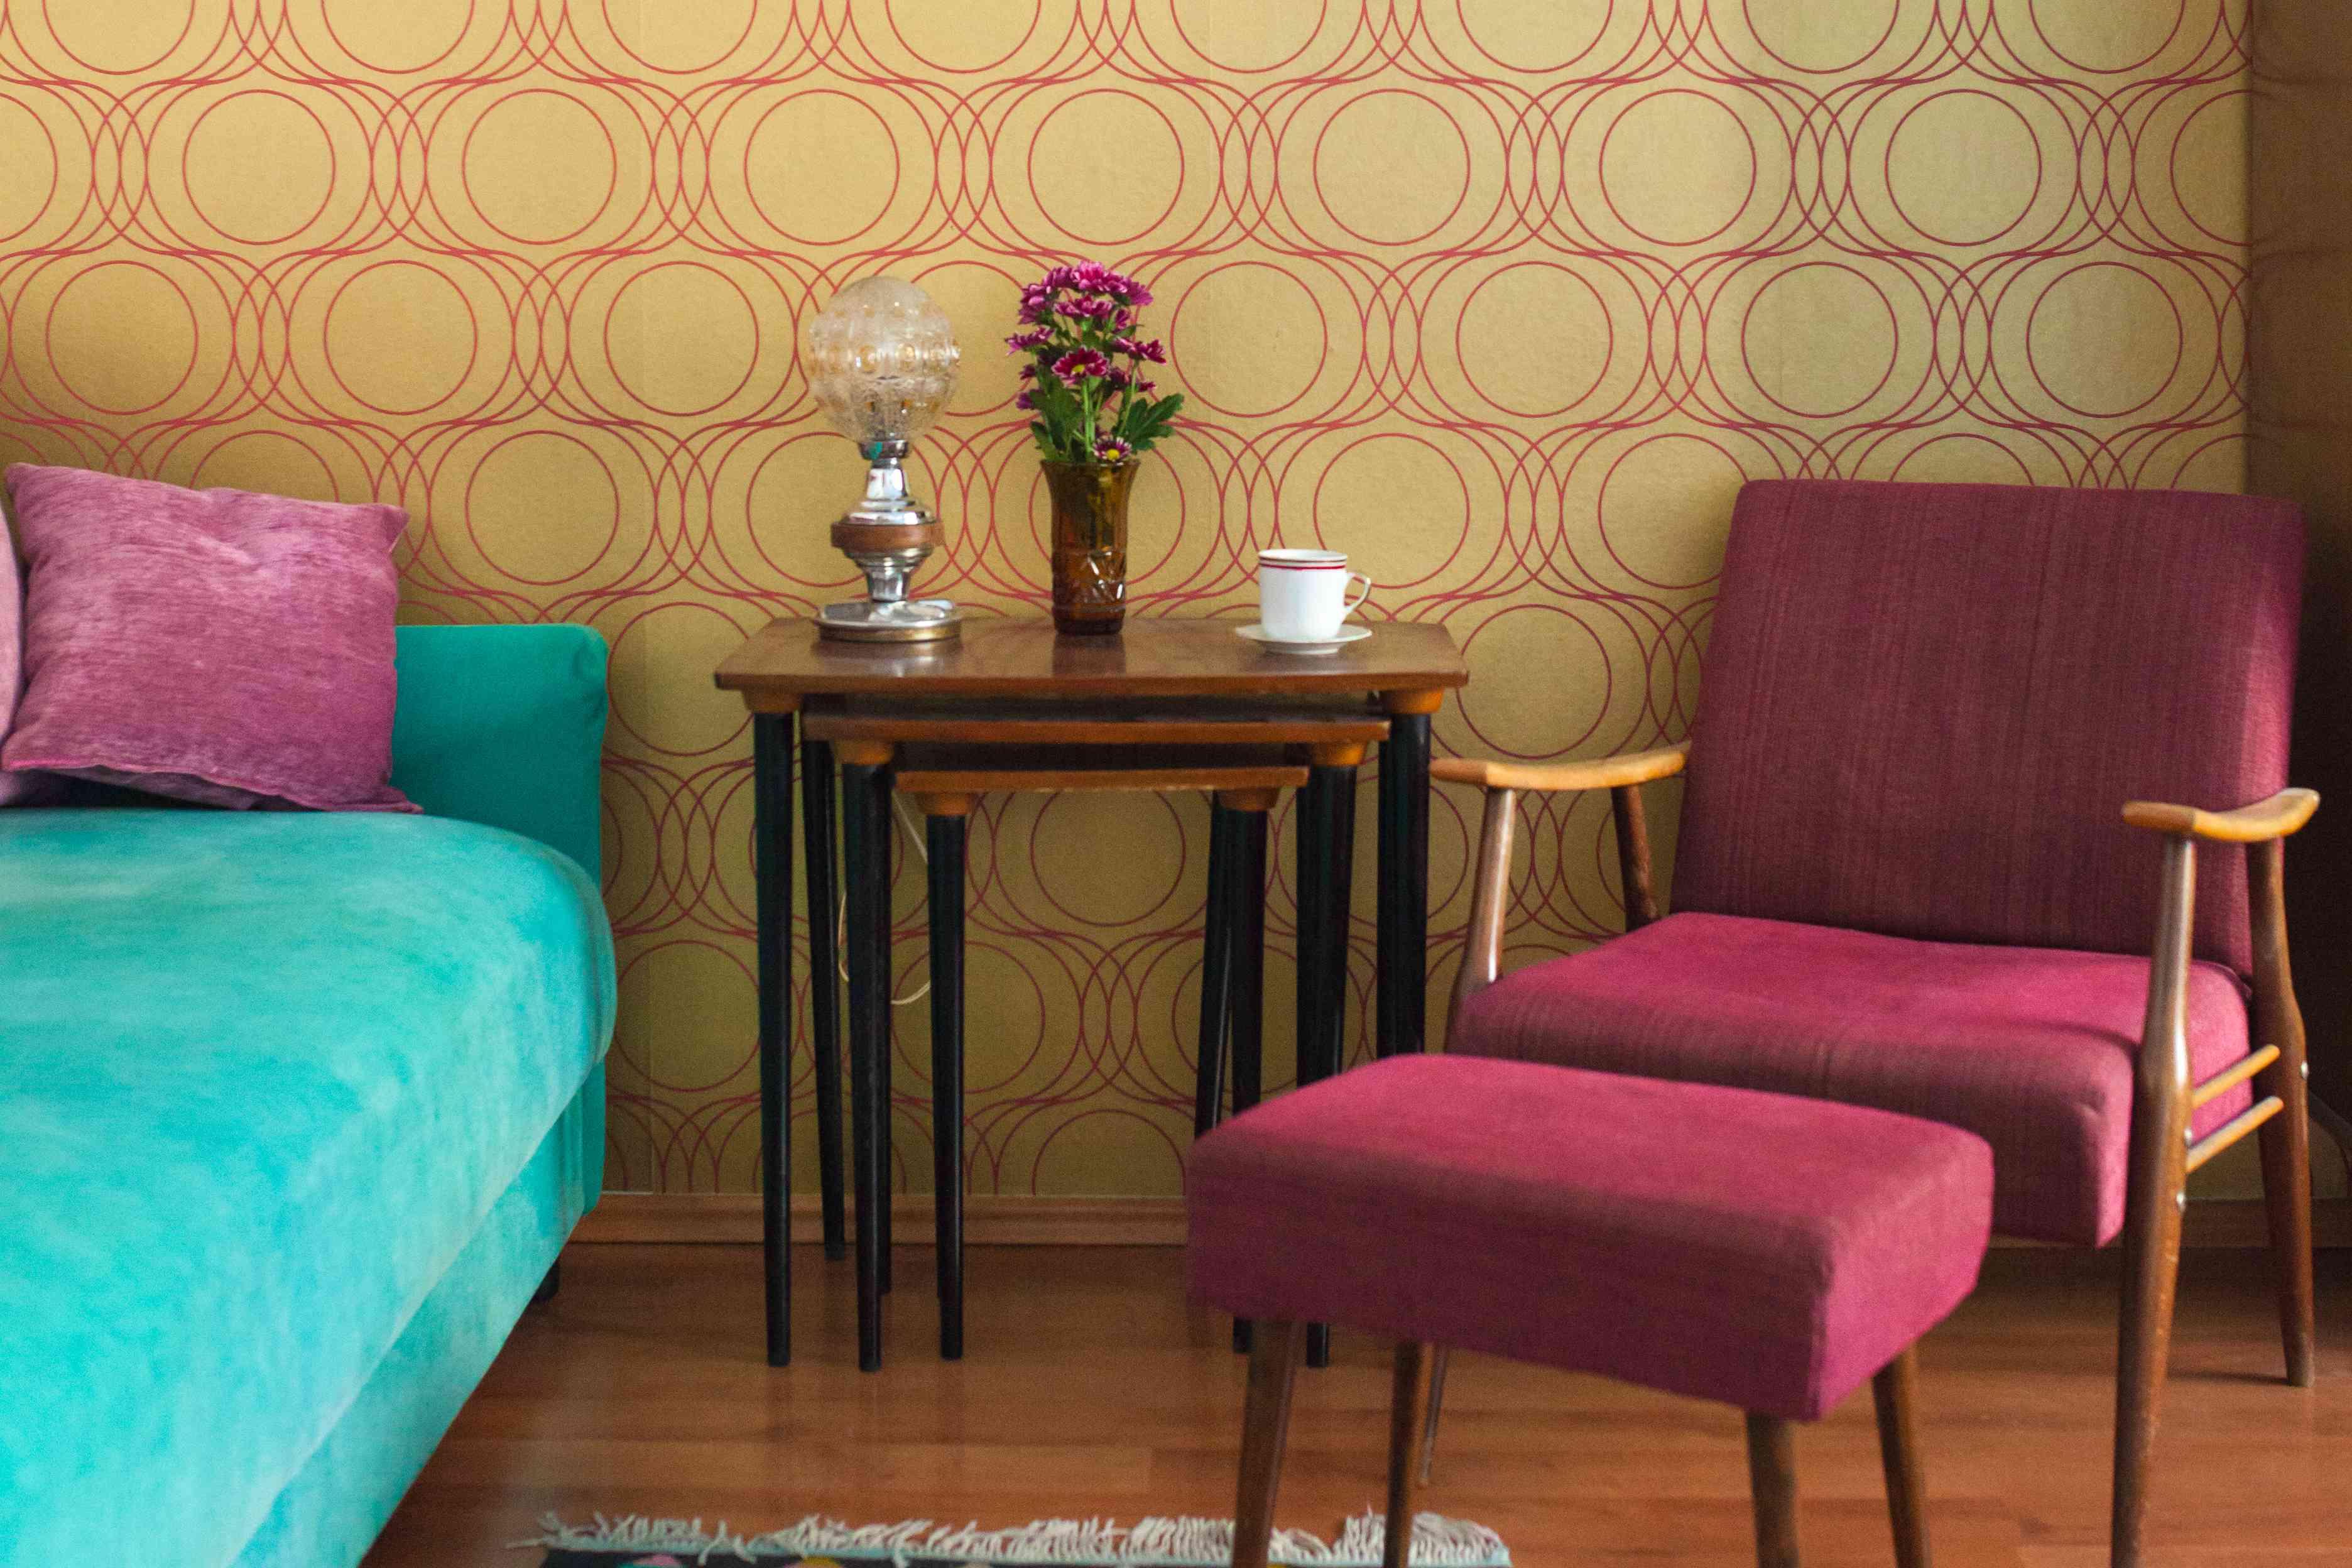 Colorful mid century decor